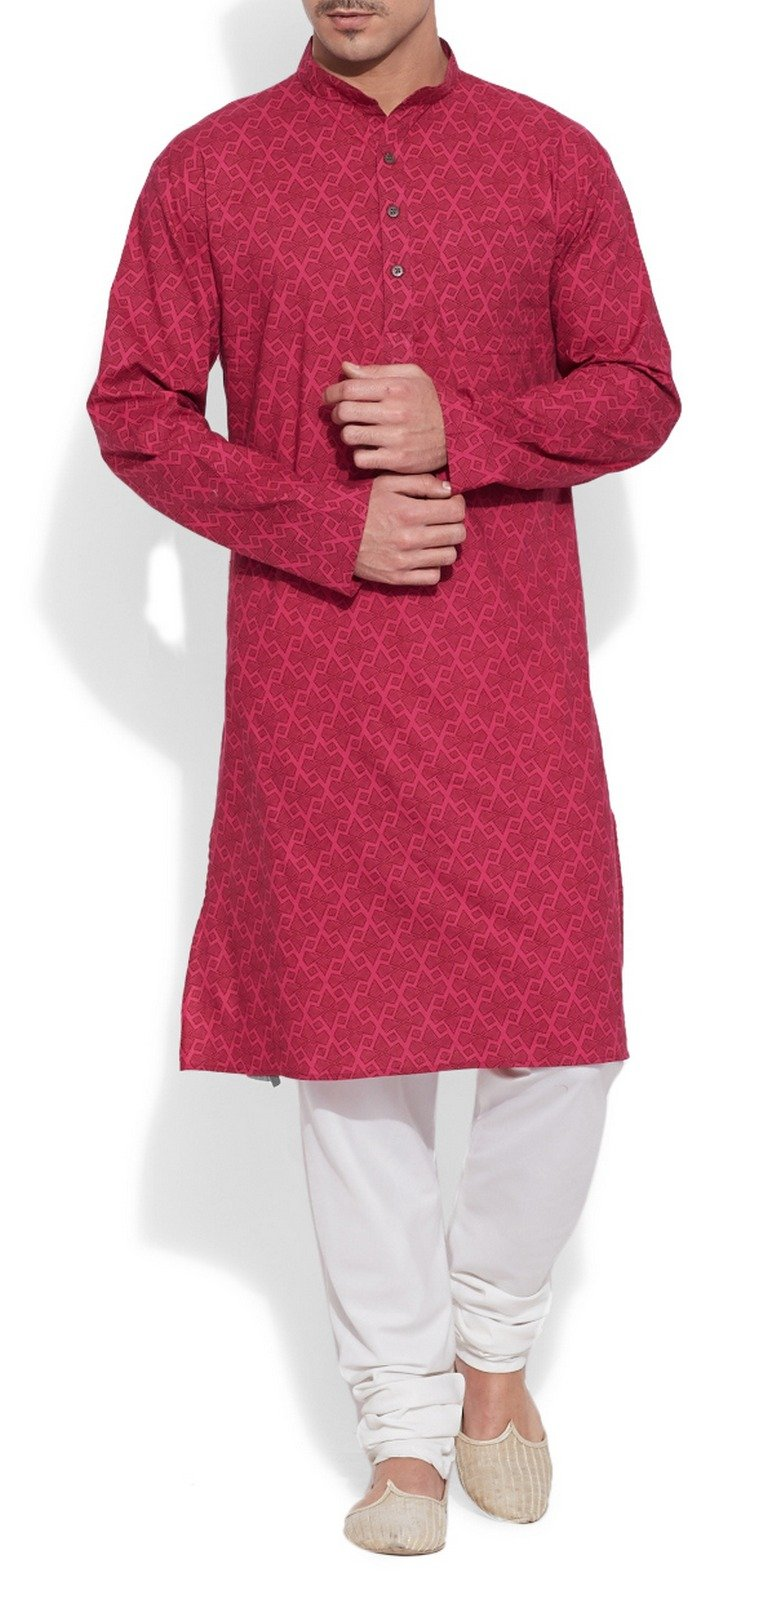 ShalinIndia Cotton Long Nehru Collar Indian Mens Kurta Shirt 3 pockets Magenta 46 by ShalinIndia (Image #3)